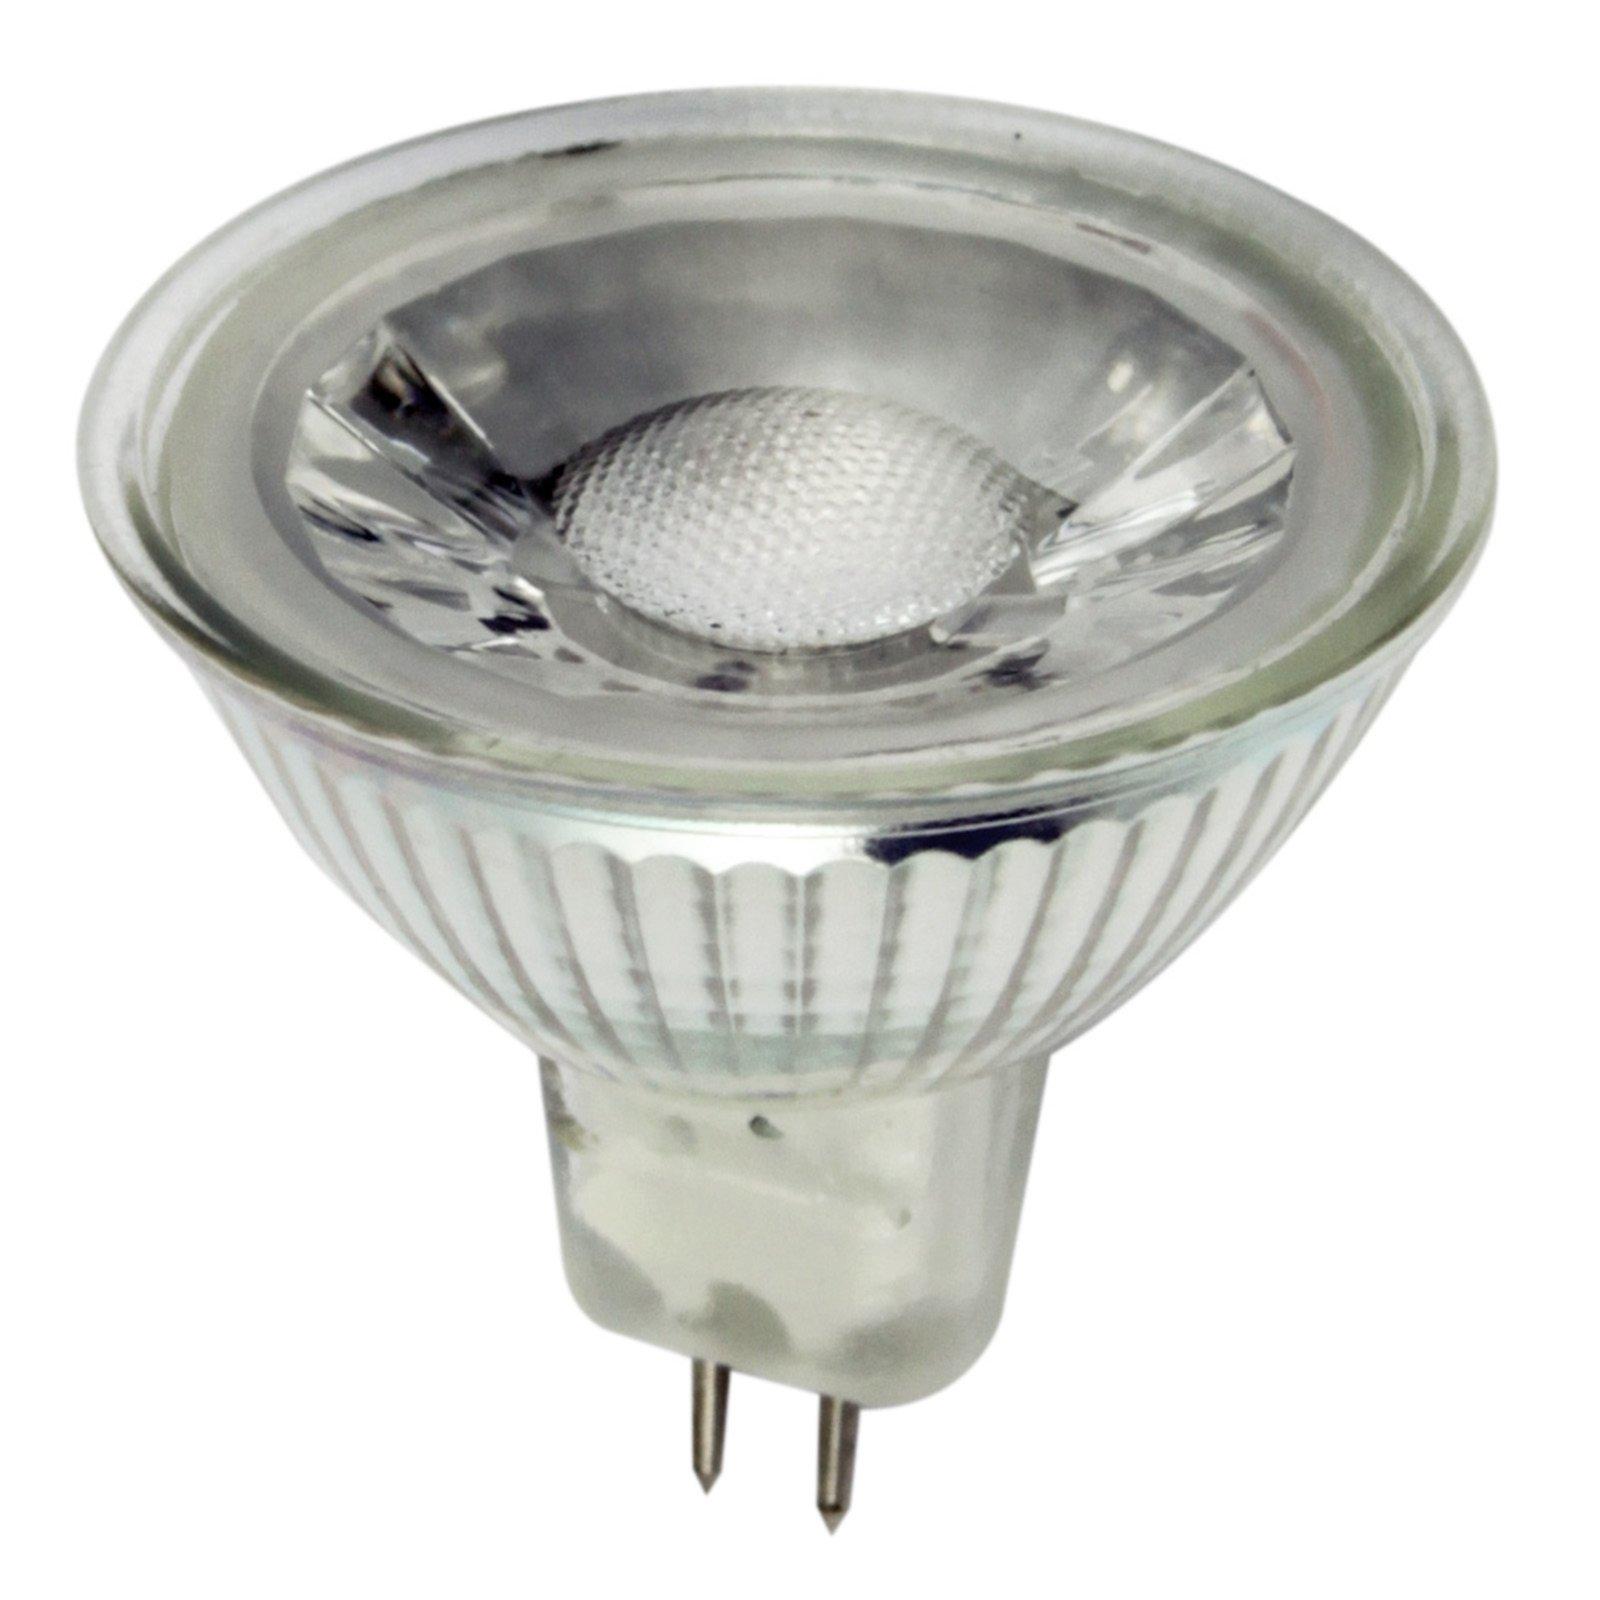 led reflektor leuchtmittel lightme mr16 gu5 5 watt warmwei led leuchtmittel. Black Bedroom Furniture Sets. Home Design Ideas